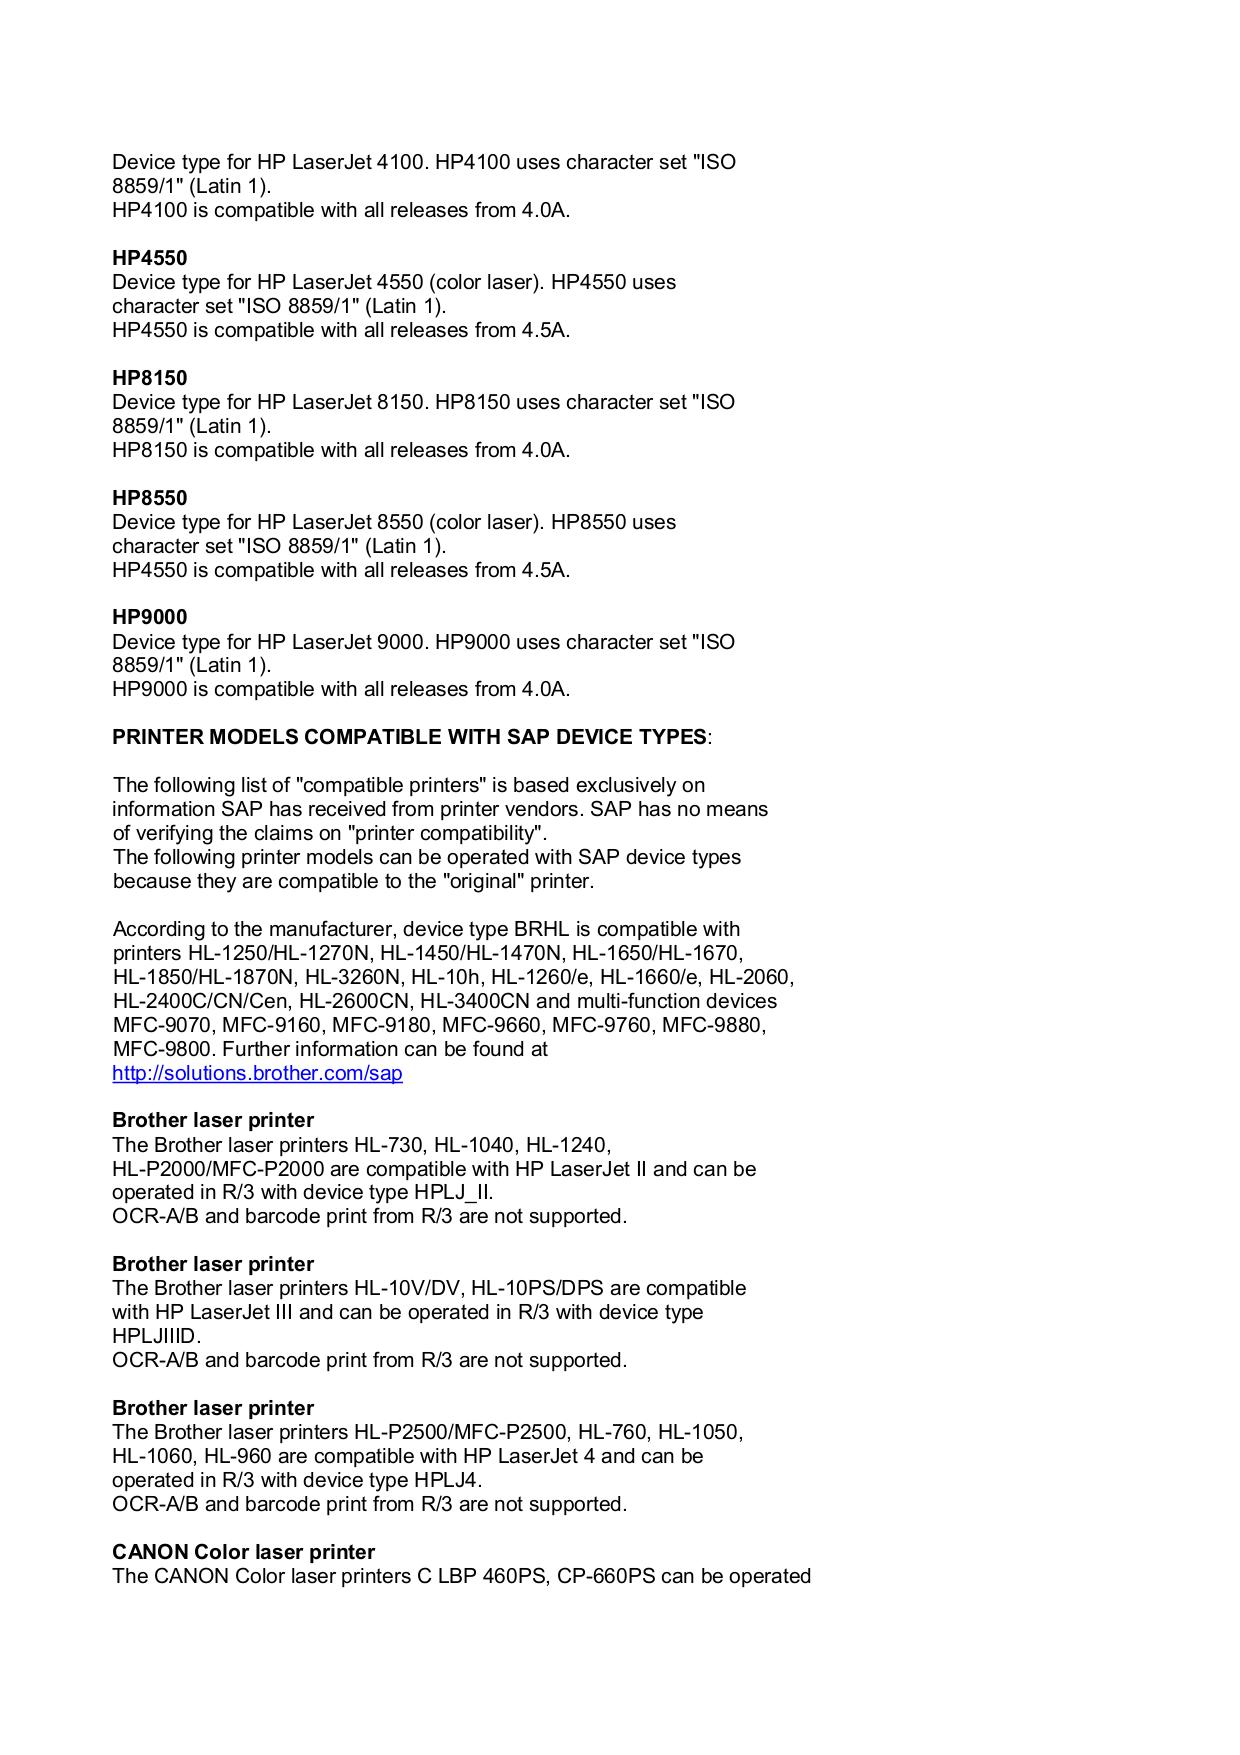 PDF manual for Xerox Printer DocuPrint 4508